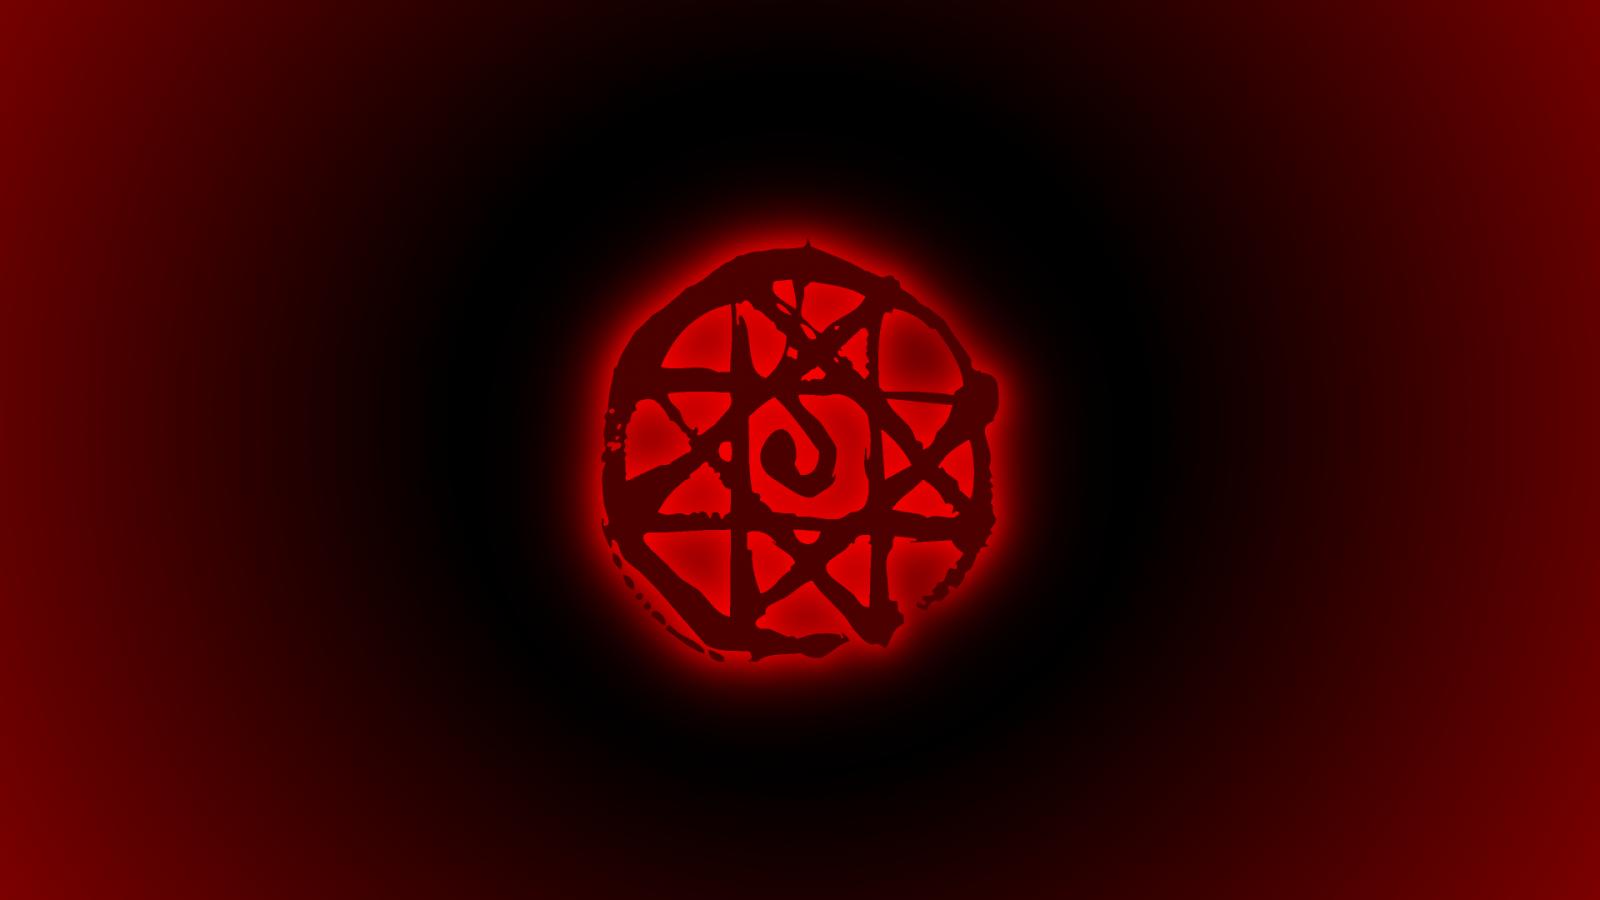 Wallpaper : illustration, heart, red, logo, circle, Full ...